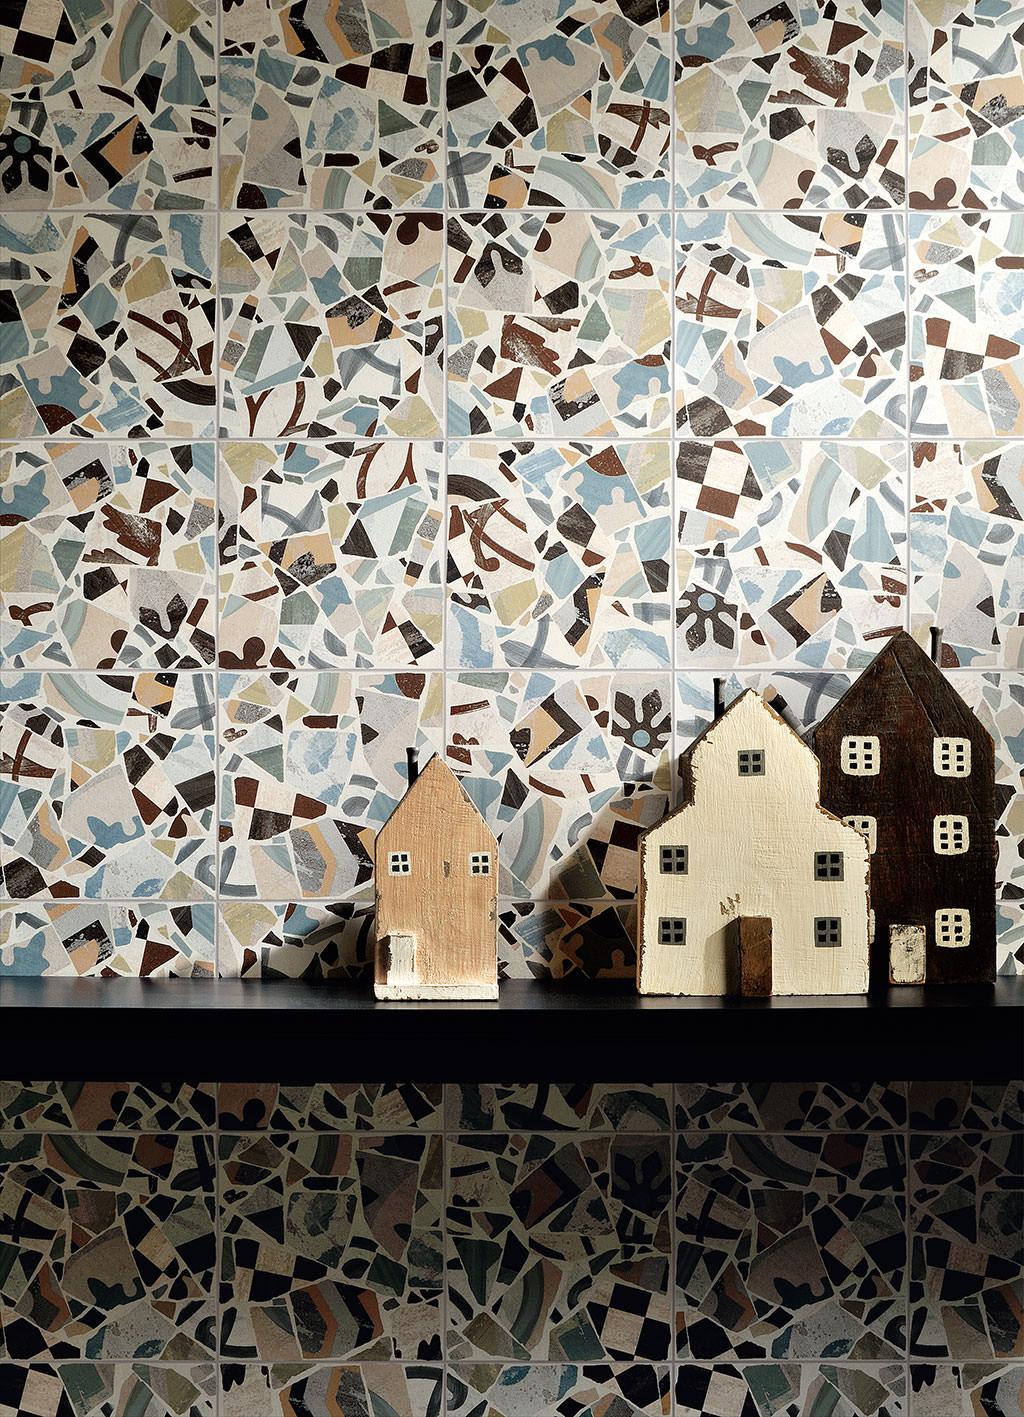 НОВО! Cementine_Cocci - Fioranese Ceramica